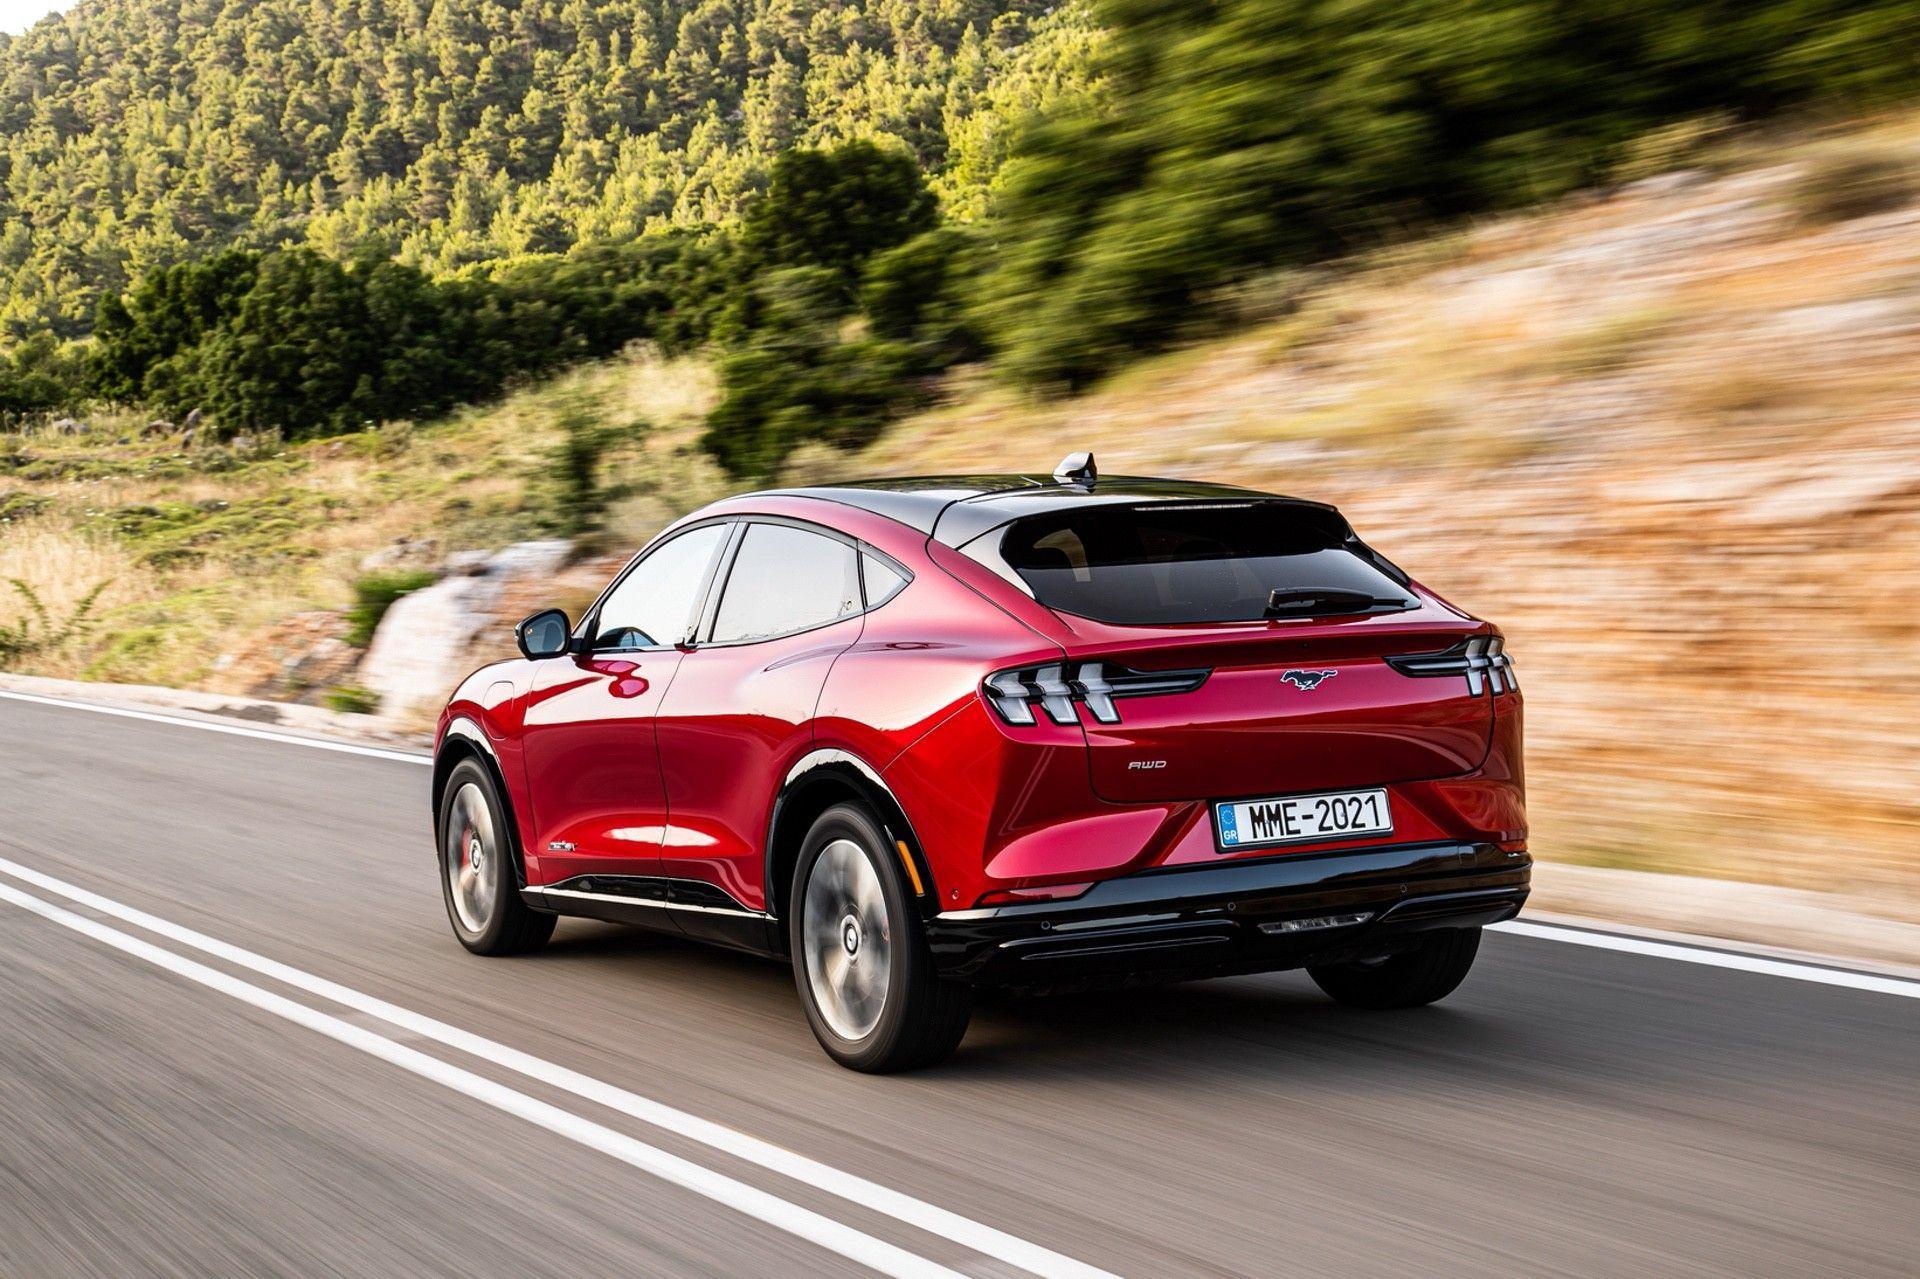 Ford_Mustang_Mach-E_greek_presskit-0124